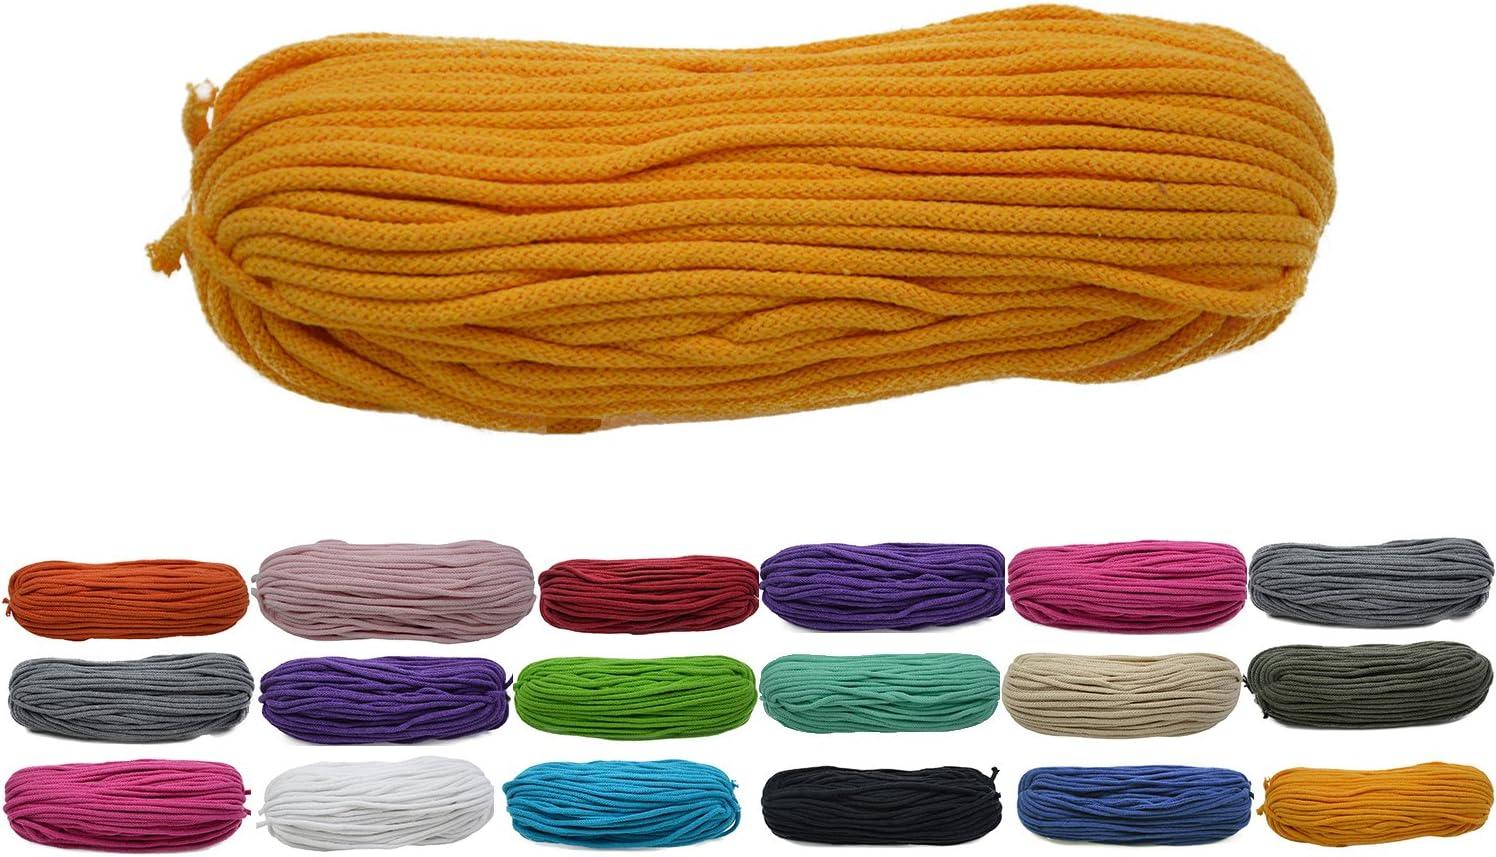 Roban Fashion 50m Baumwollkordel 5mm breit gelb